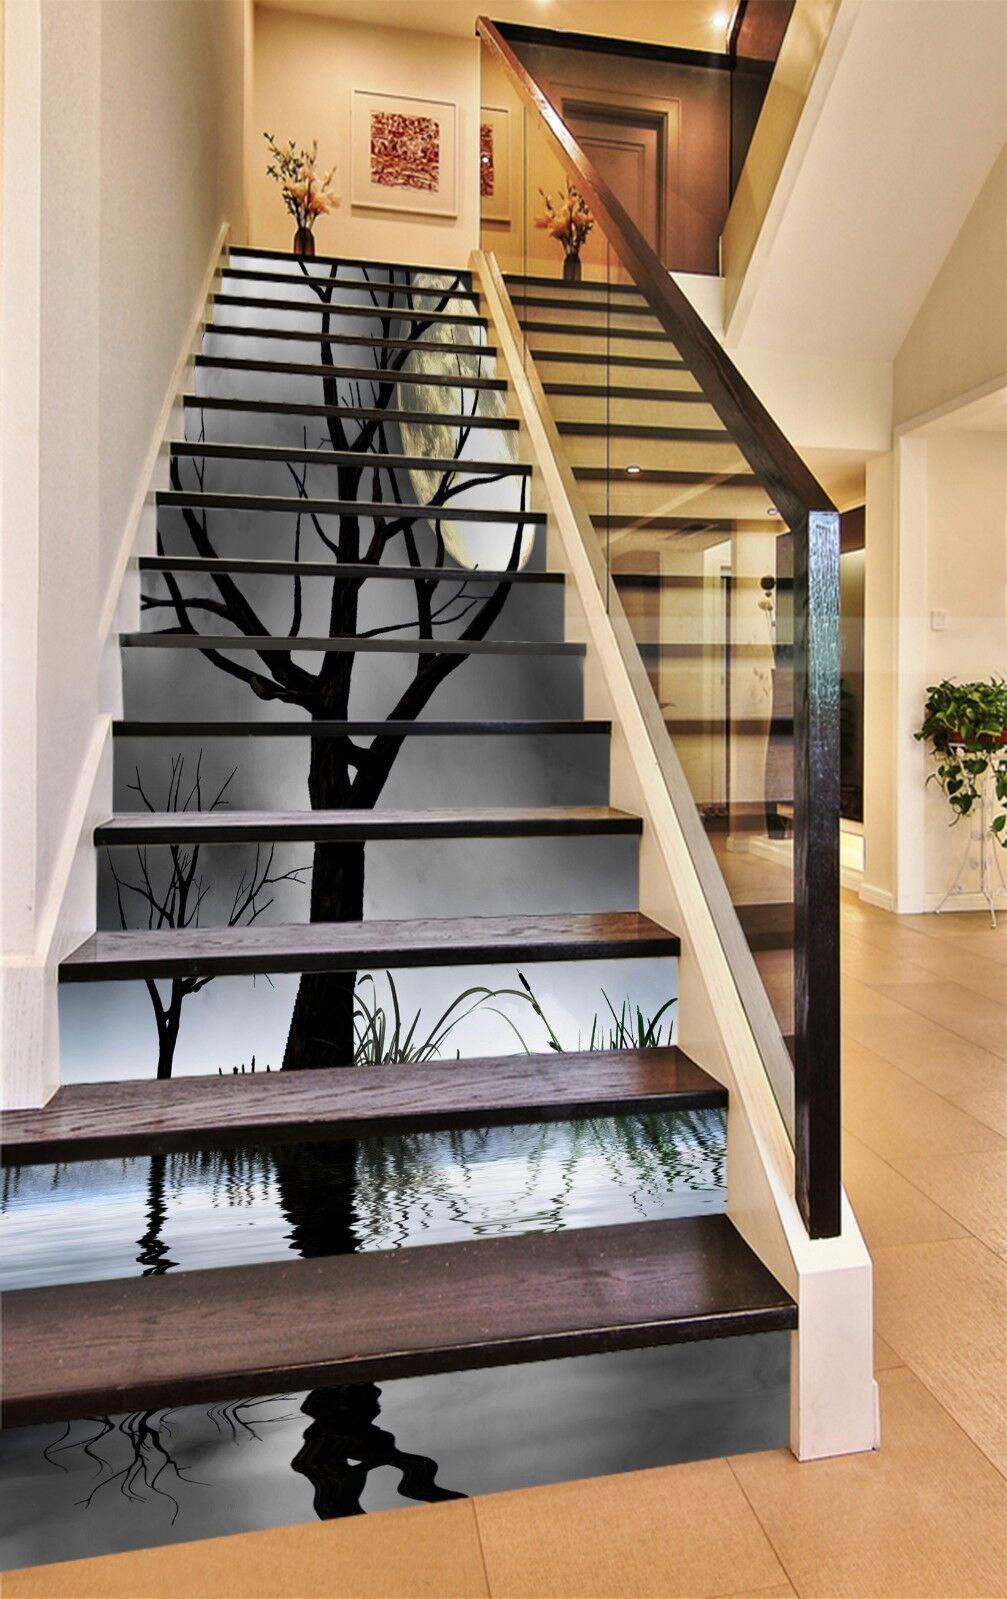 3D Moon tree 352 Stair Risers Decoration Photo Mural Vinyl Decal Wallpaper UK